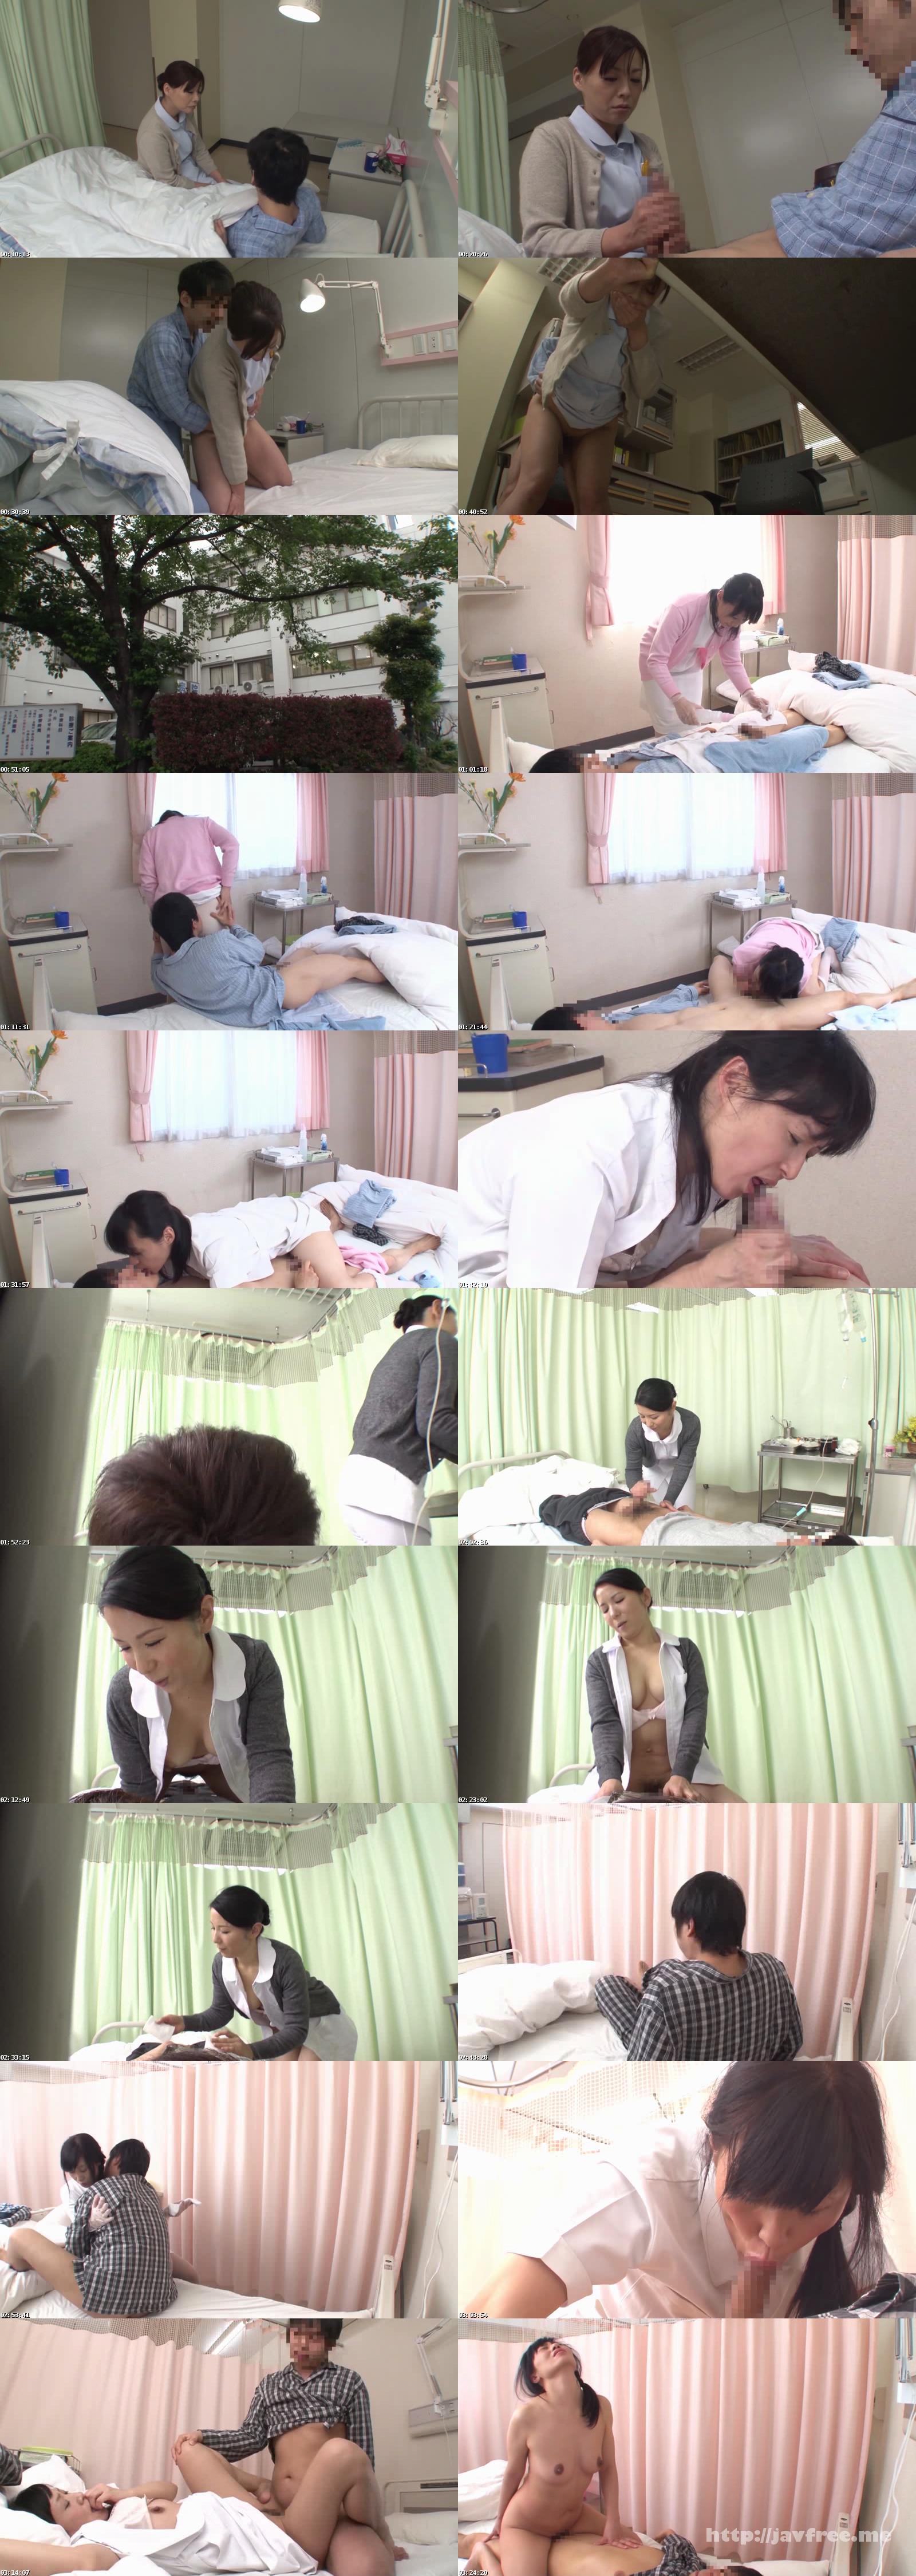 [DANDY-419] 「『おばさんで本当にいいの?』若くて硬い勃起角度150度の少年チ○ポに抱きつかれた看護師はヤられても本当は嫌じゃない」VOL.3 - image  on https://javfree.me